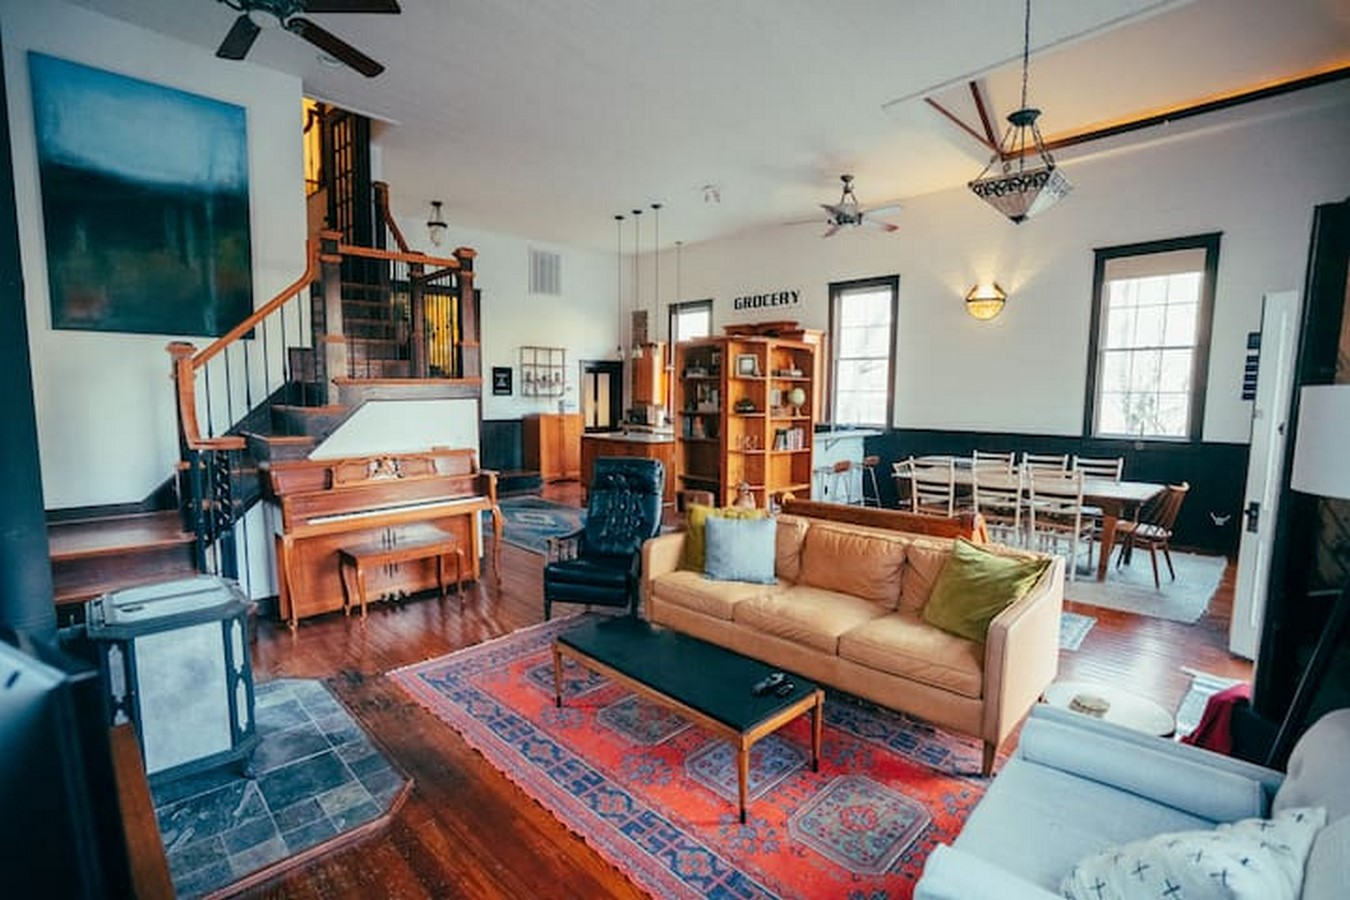 15 beautiful vintage apartments around the world - Sheet24